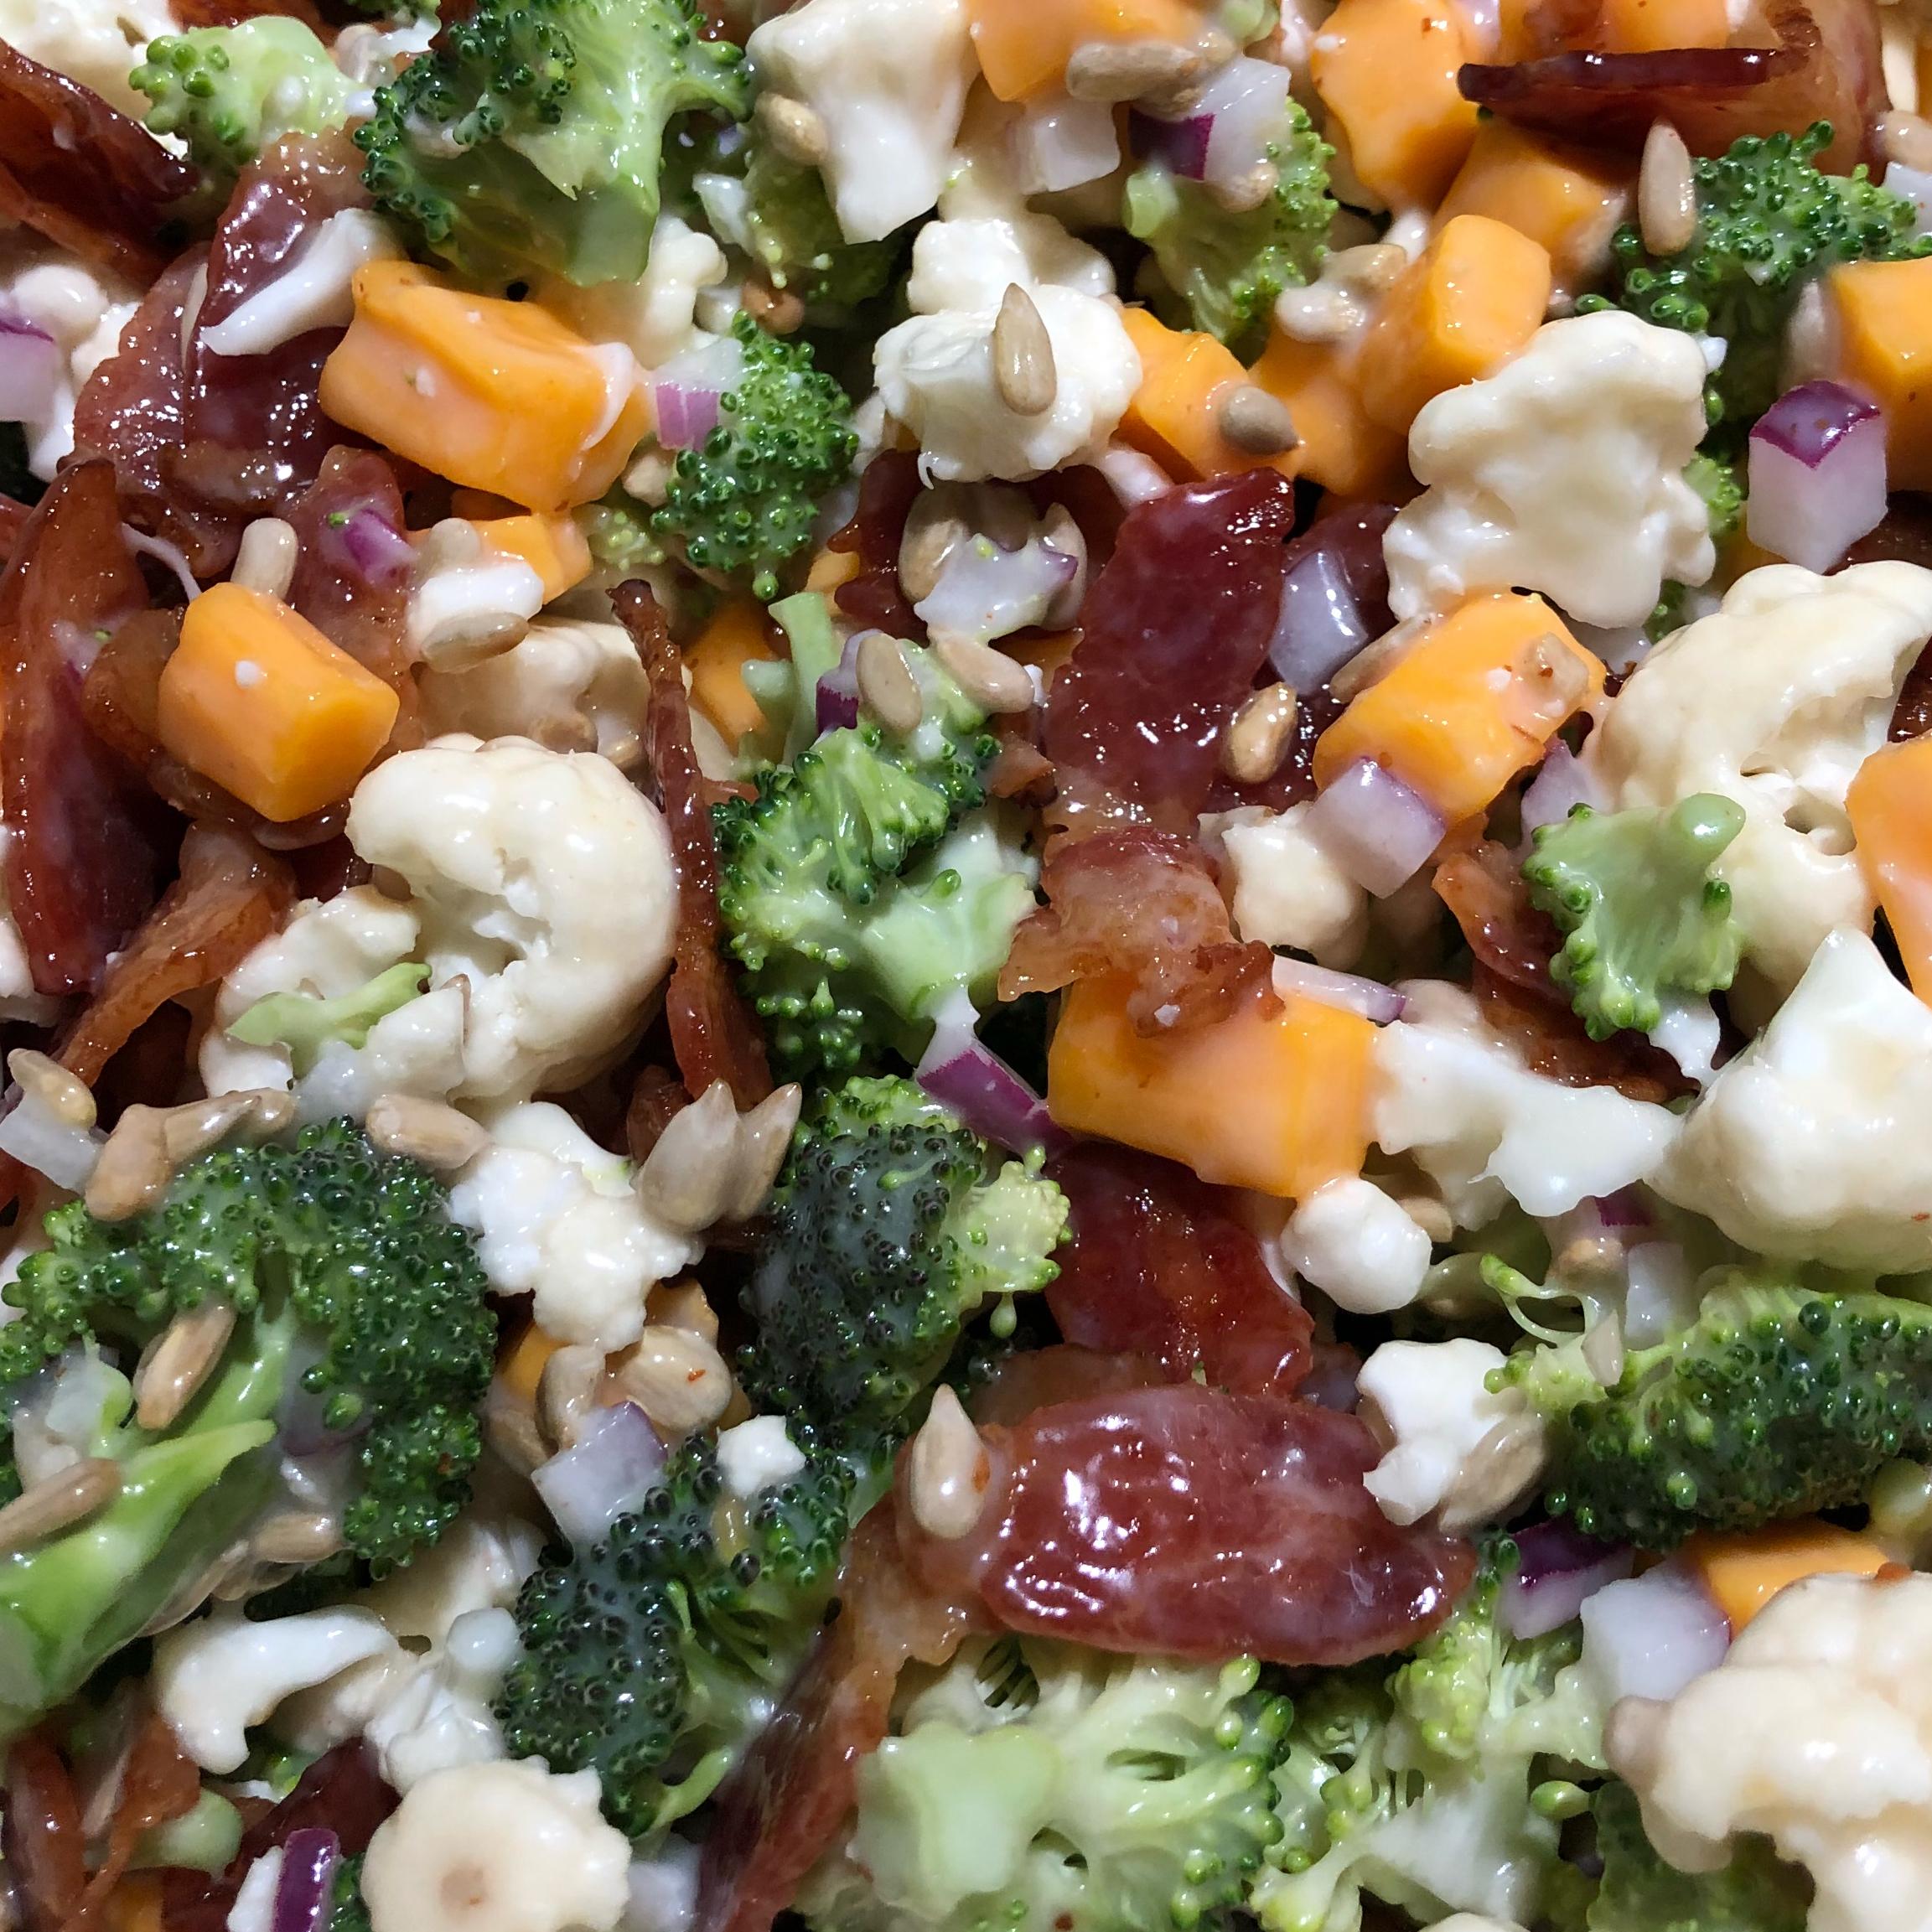 Bop's Broccoli Cauliflower Salad Olivia22